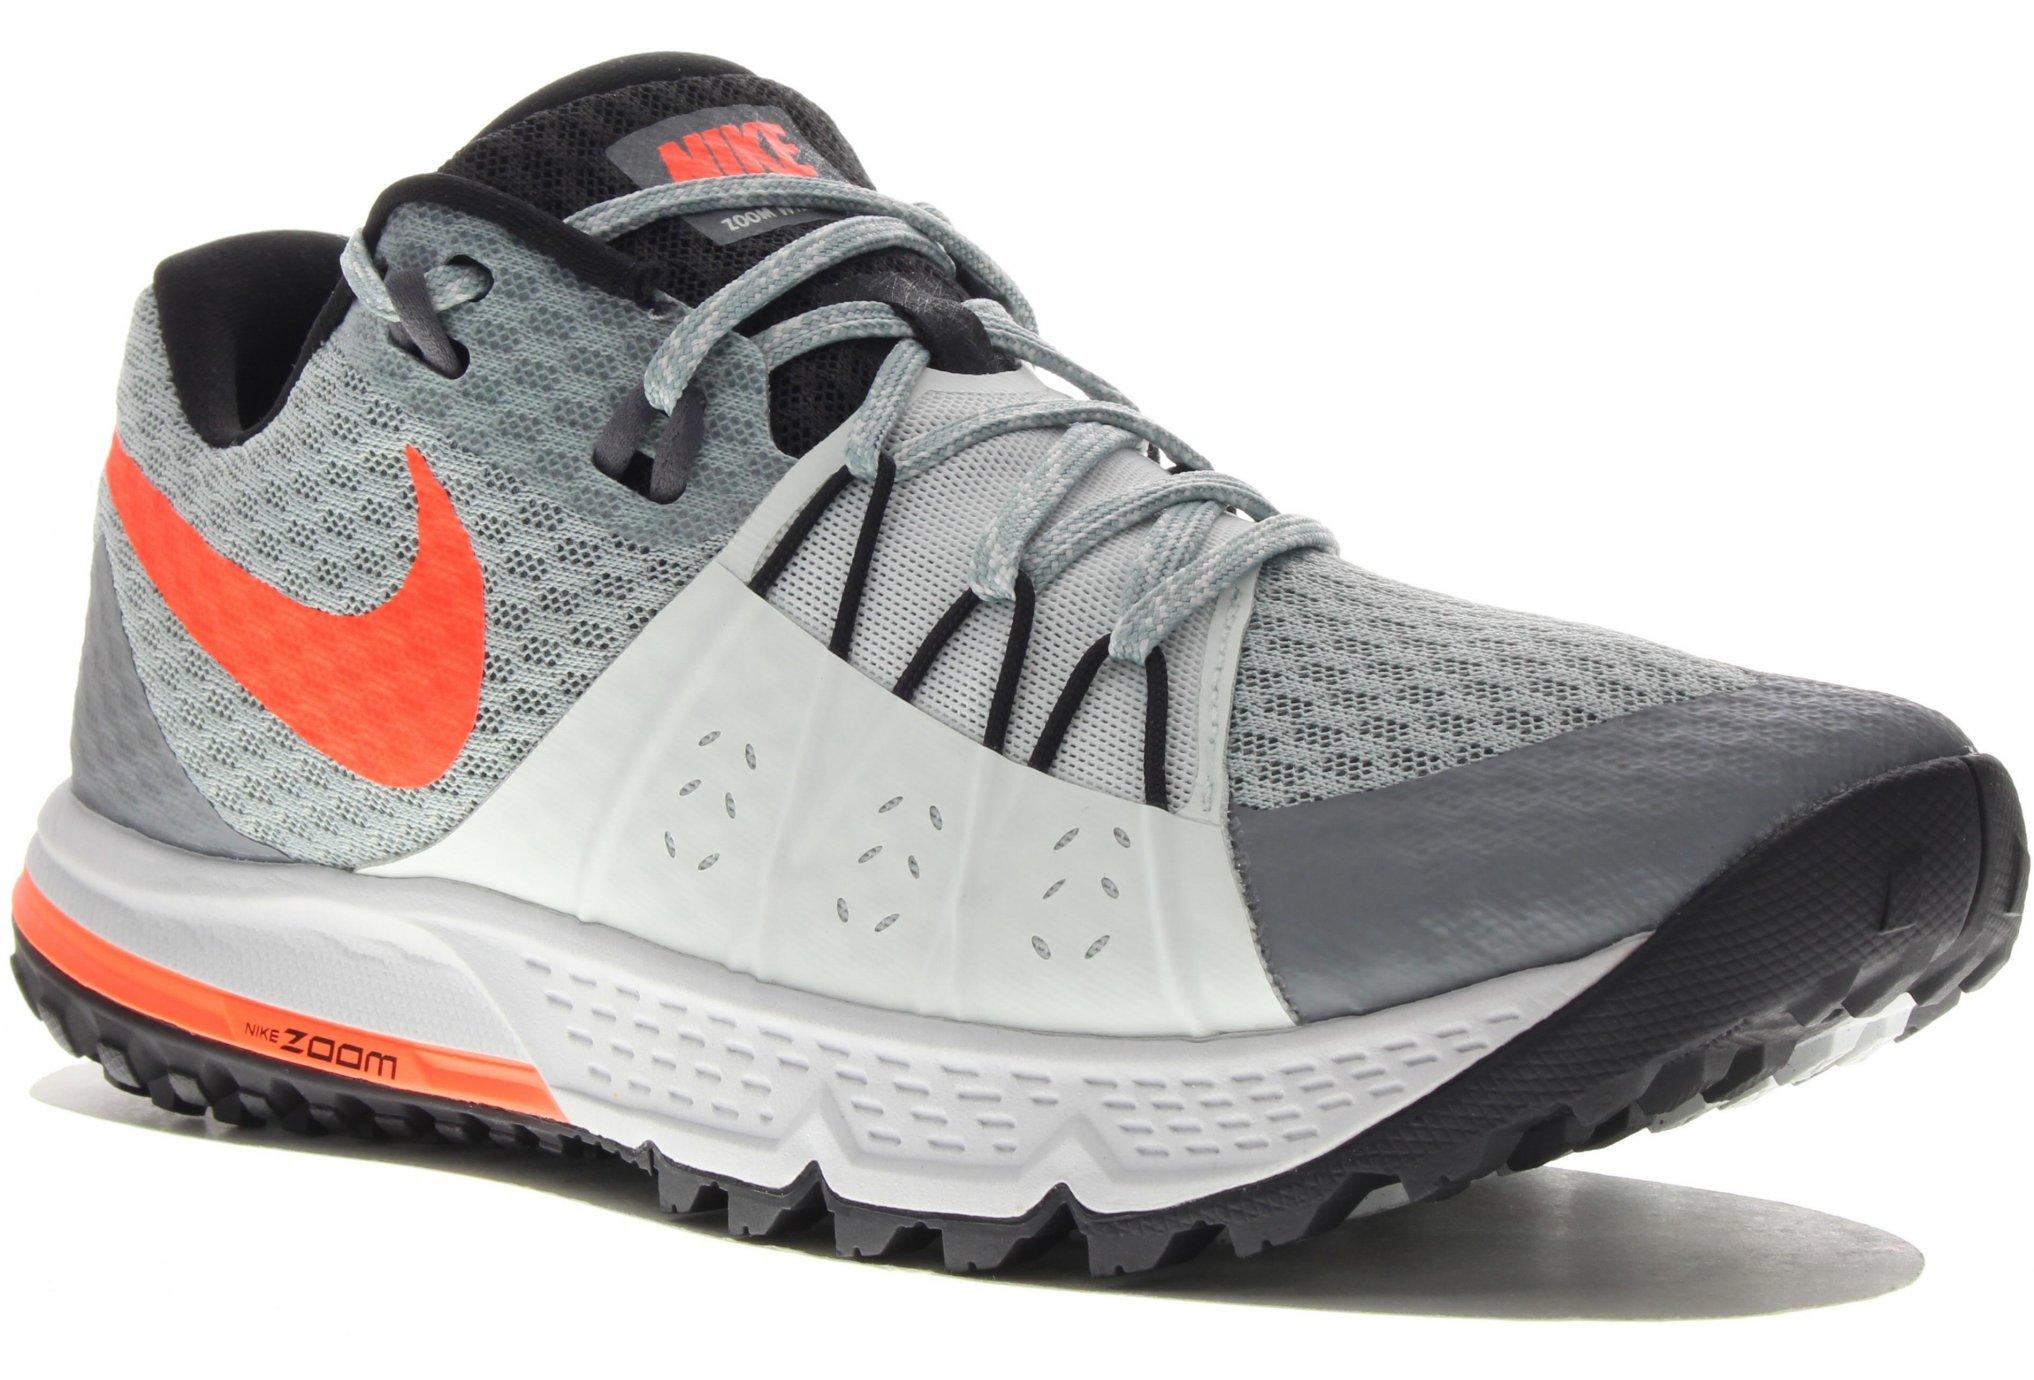 Nike Air Zoom Wildhorse 4 W Chaussures running femme